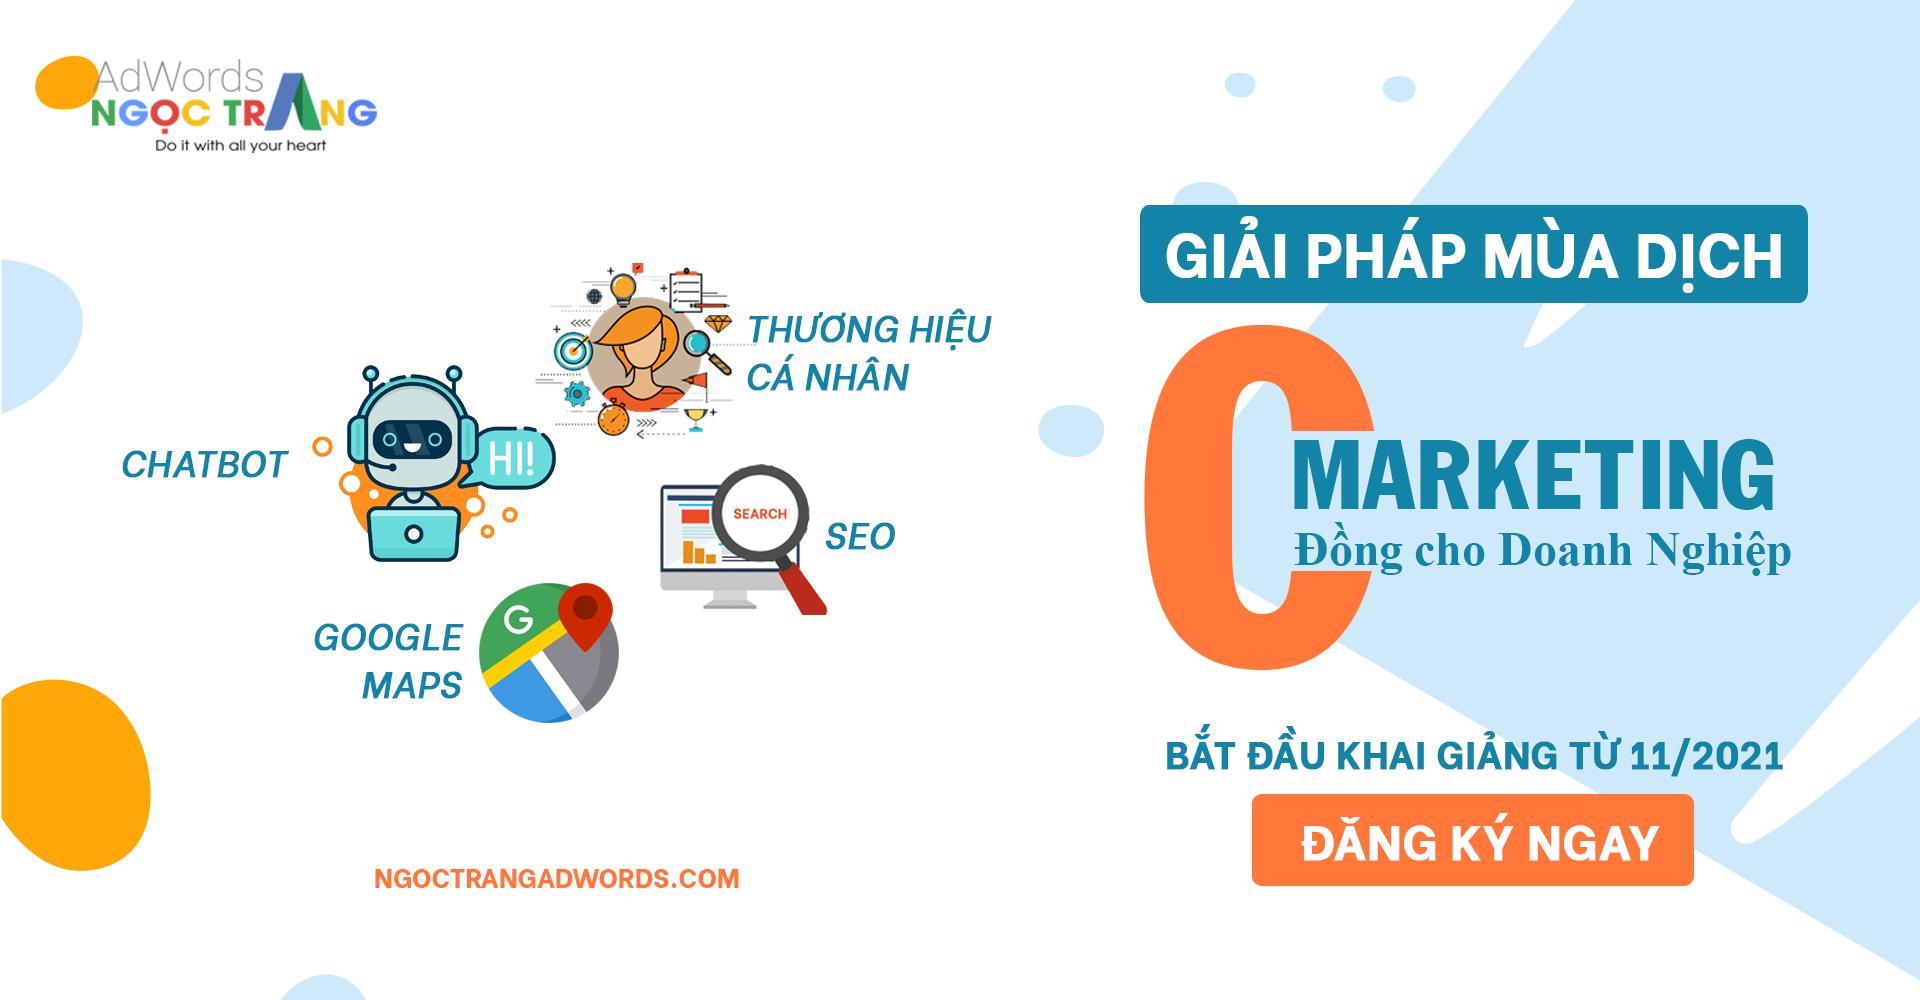 Ngoc Trang addword